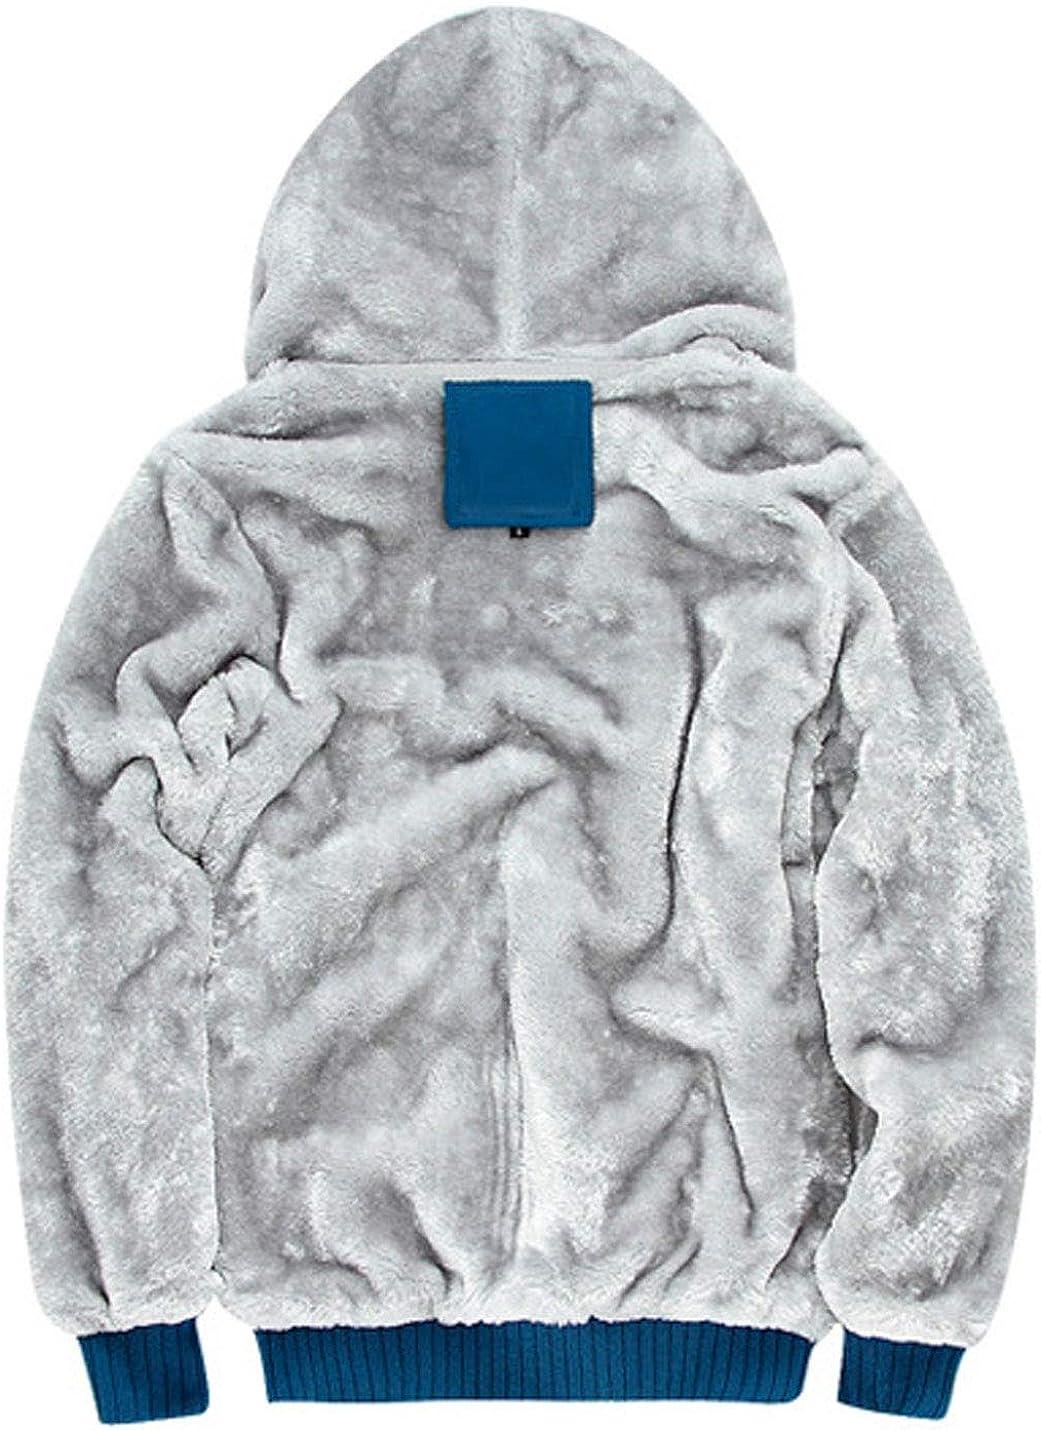 Rungion Womens Tie Dye Winter Thick Warm Fleece Coat Zip Up Jacket Outwear with Pockets